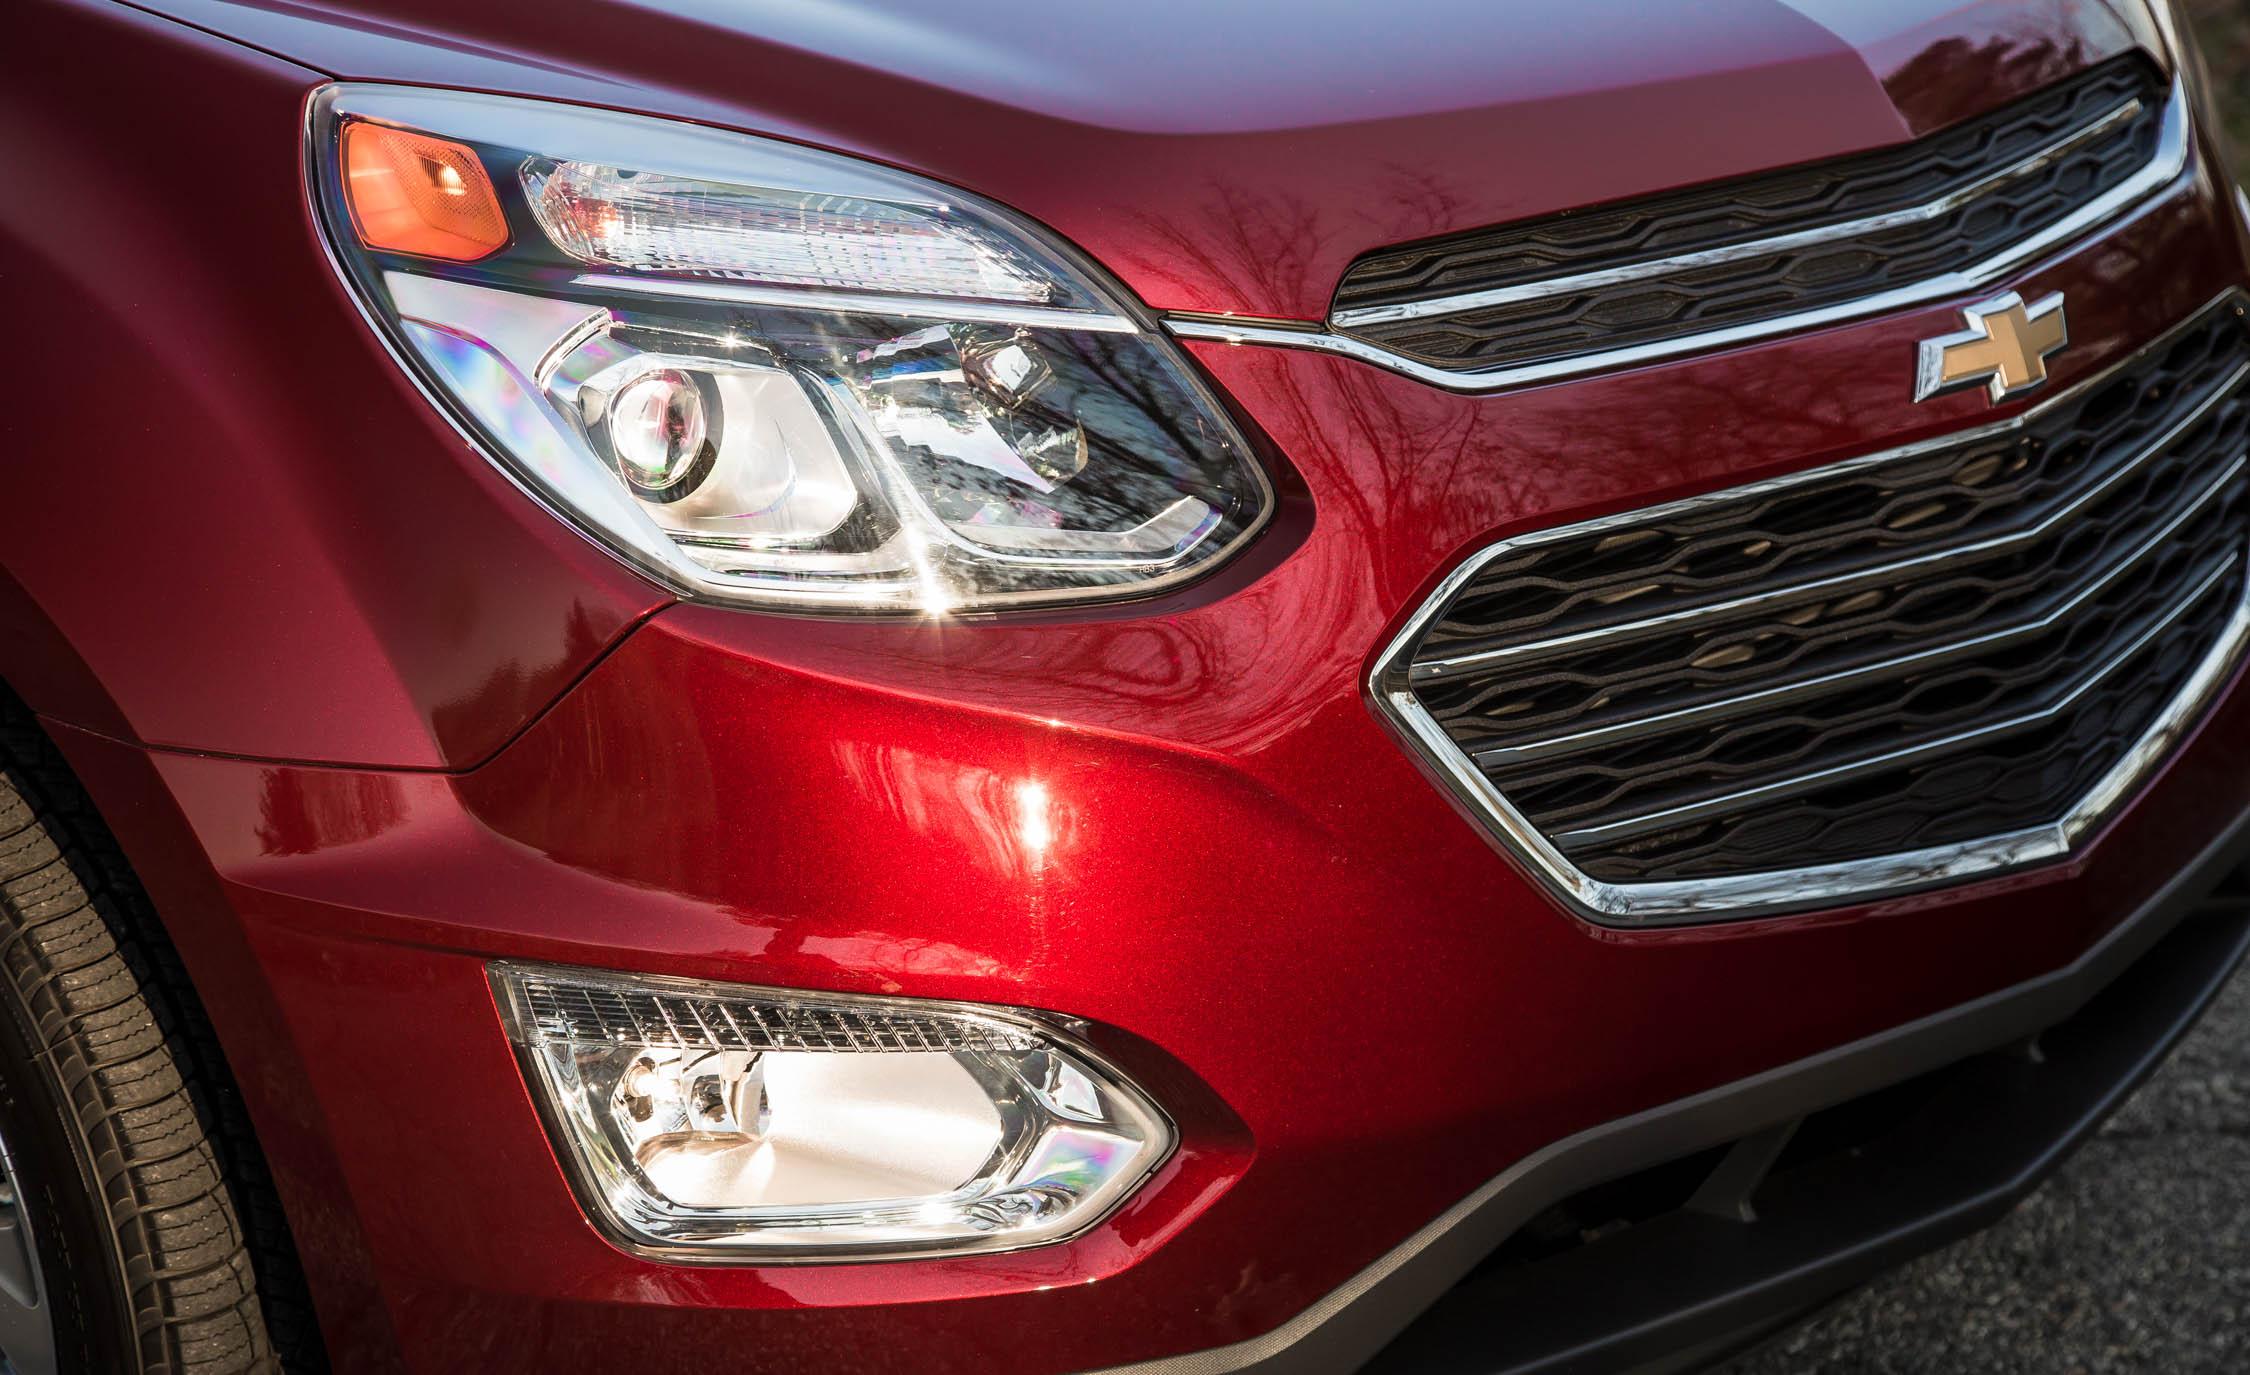 2016 Chevrolet Equinox LTZ (Photo 17 of 25)